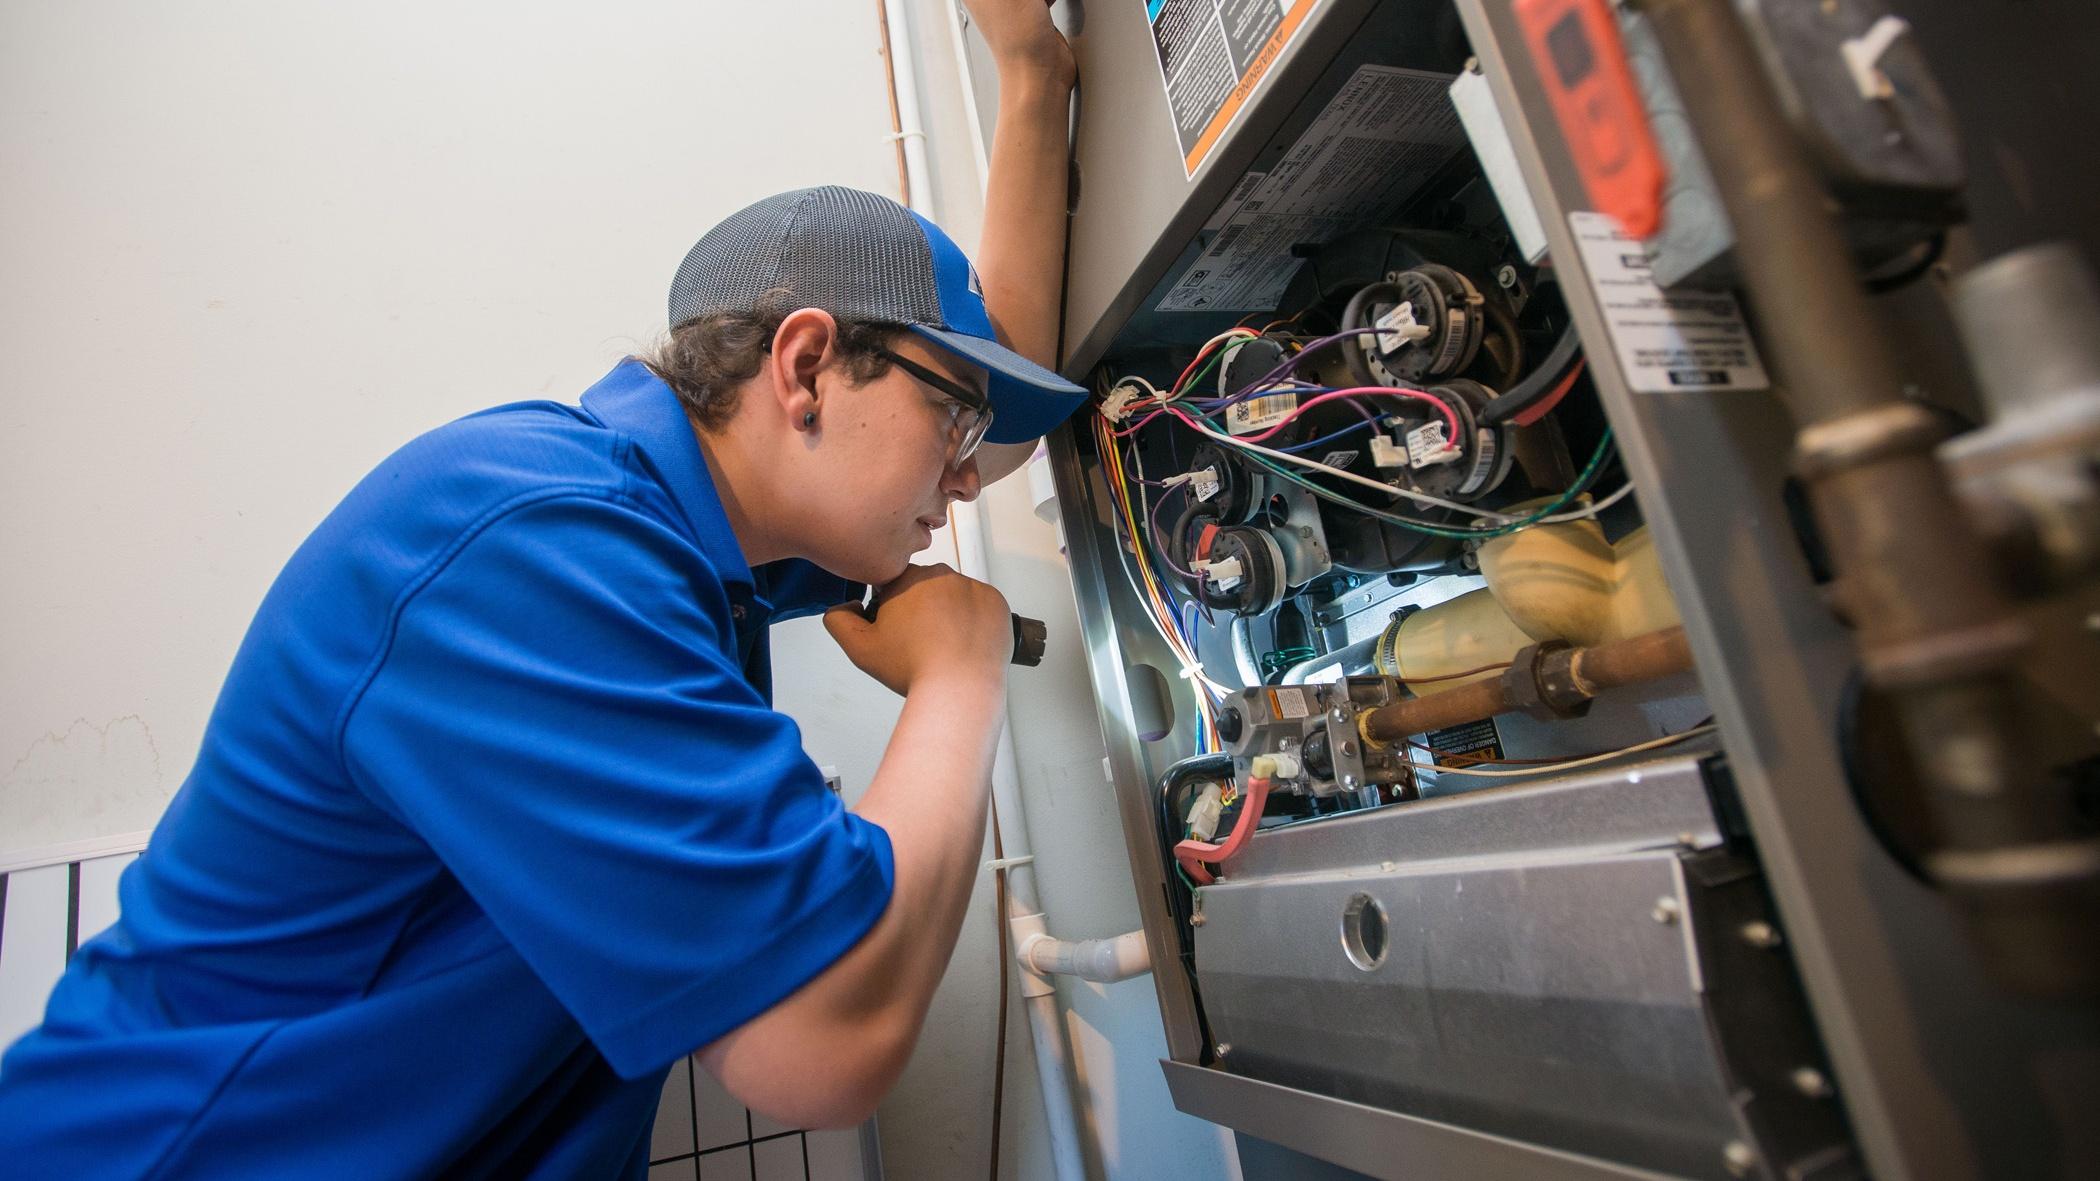 binder-furnace-heat-service-repair.jpg